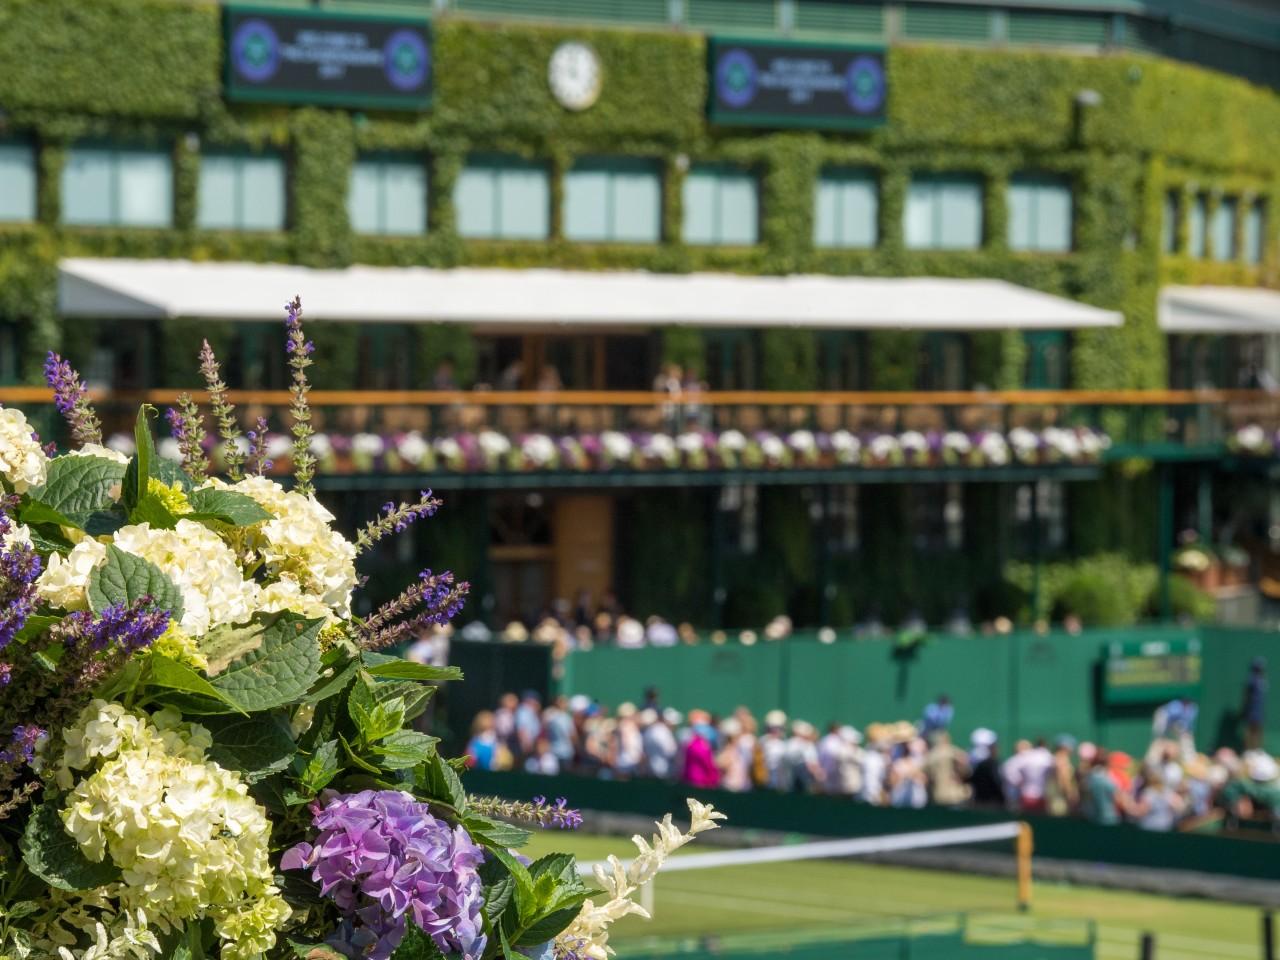 Wimbledon - Court No.1 - 01 July 2019